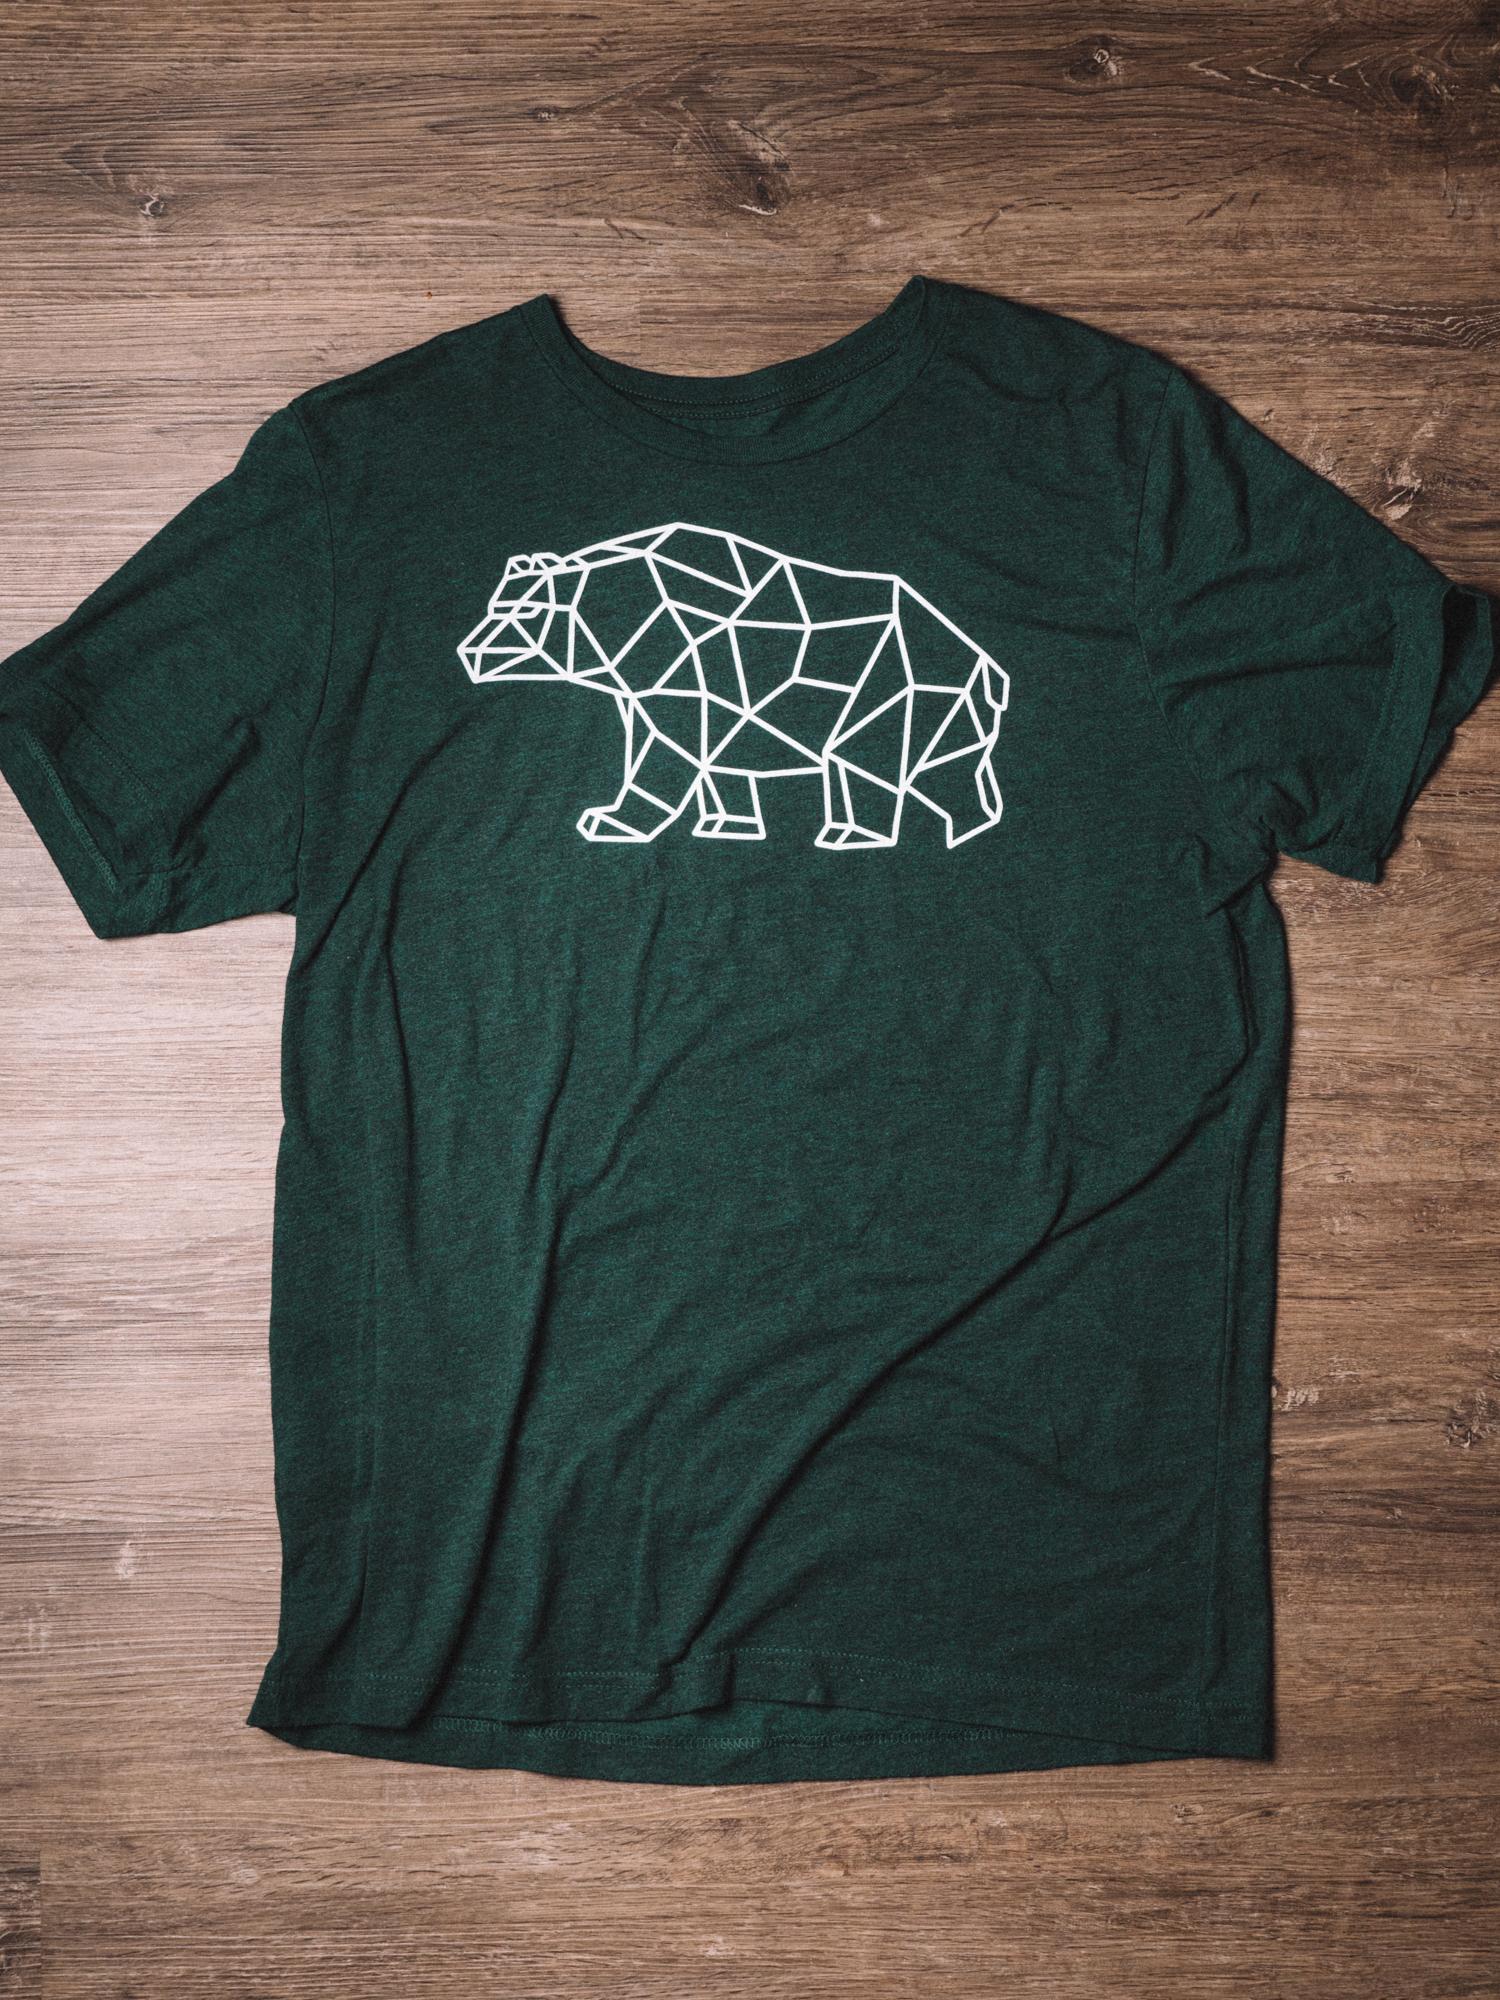 Leftcoast_green_Shirt_.jpg